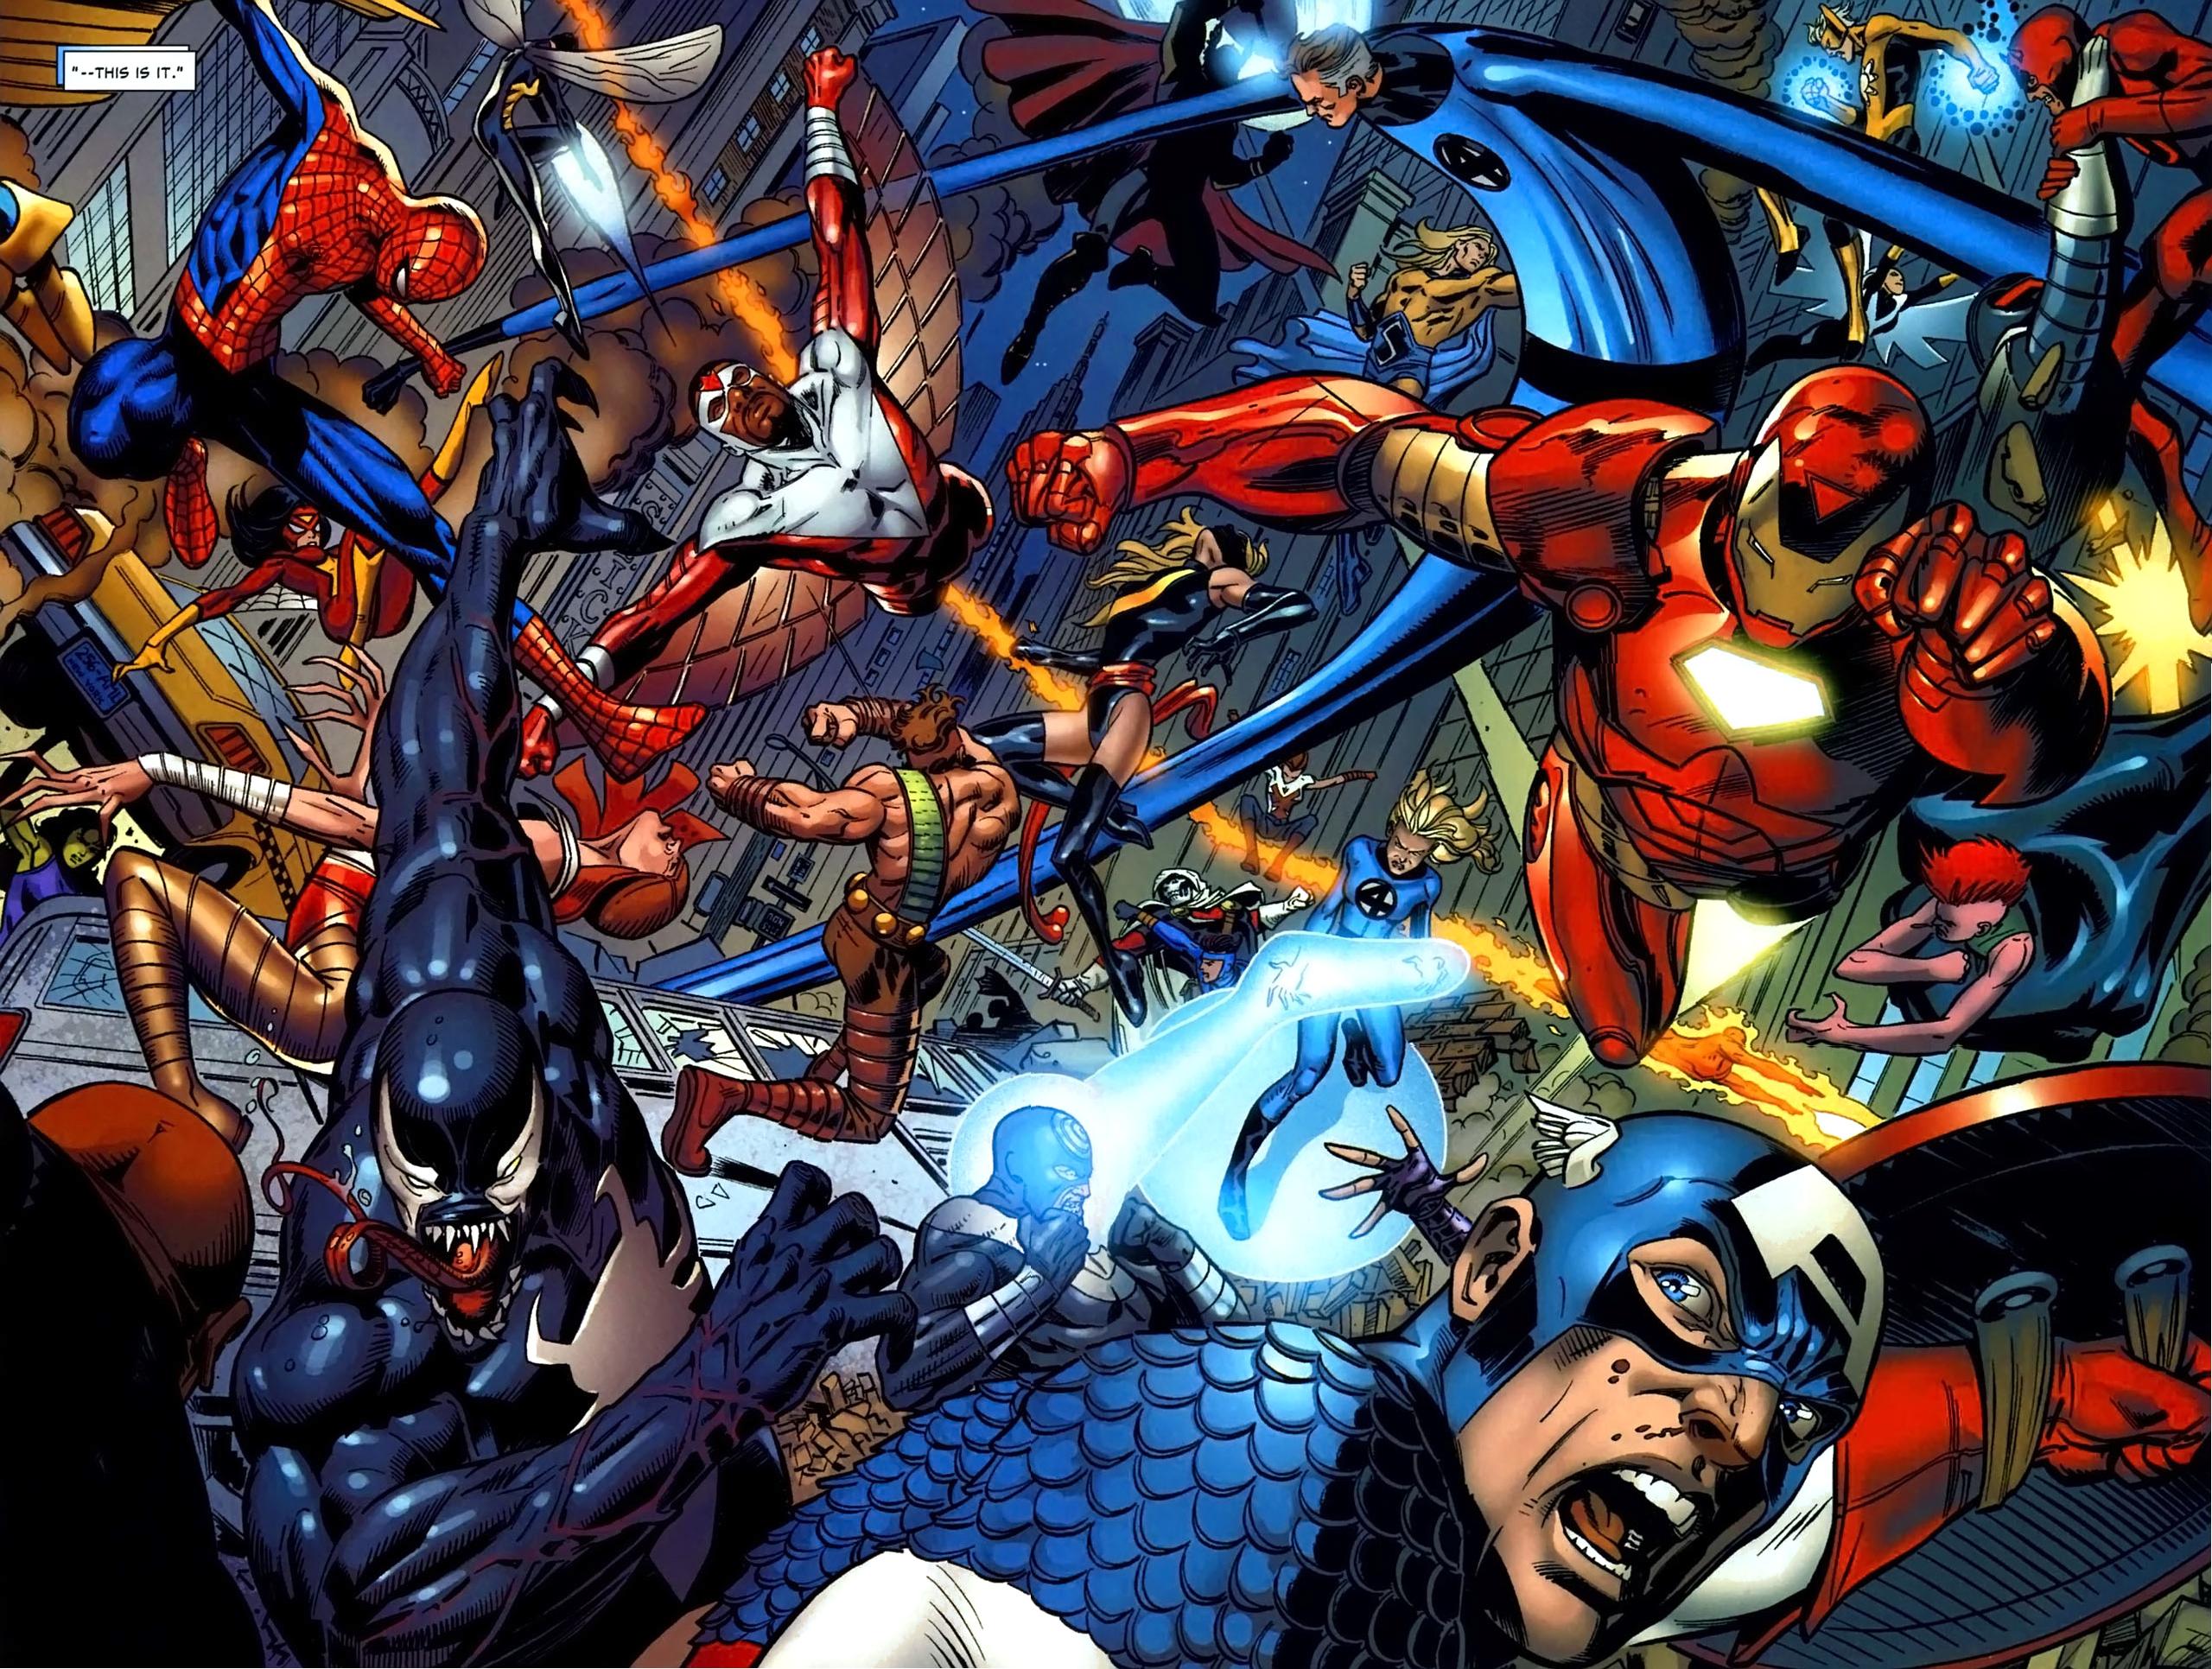 Iron spiderman vs spiderman - photo#15